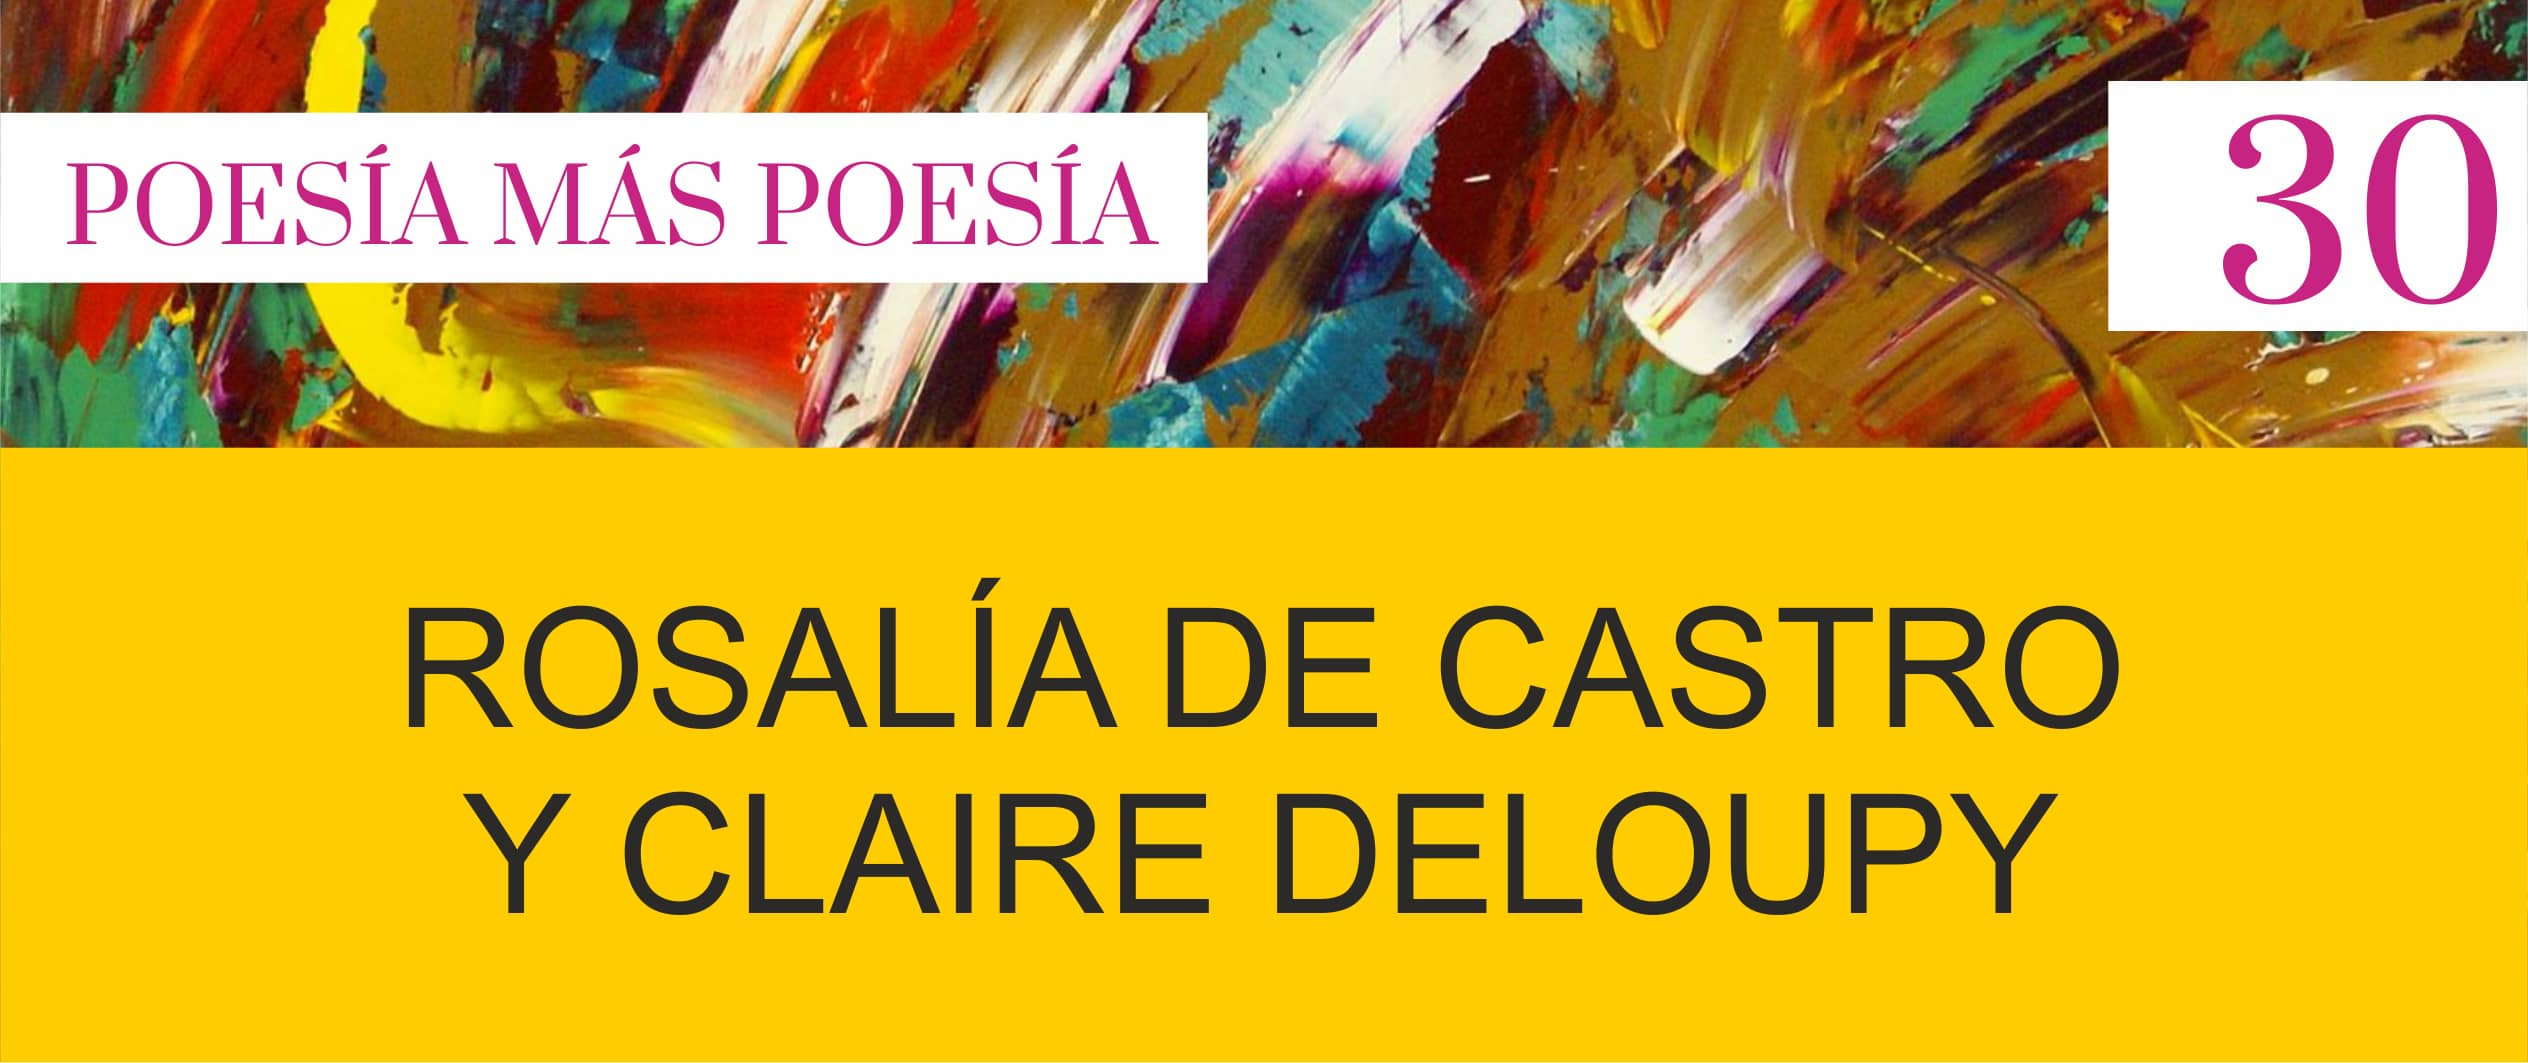 portadas revista poe DU76d - Poesia Online